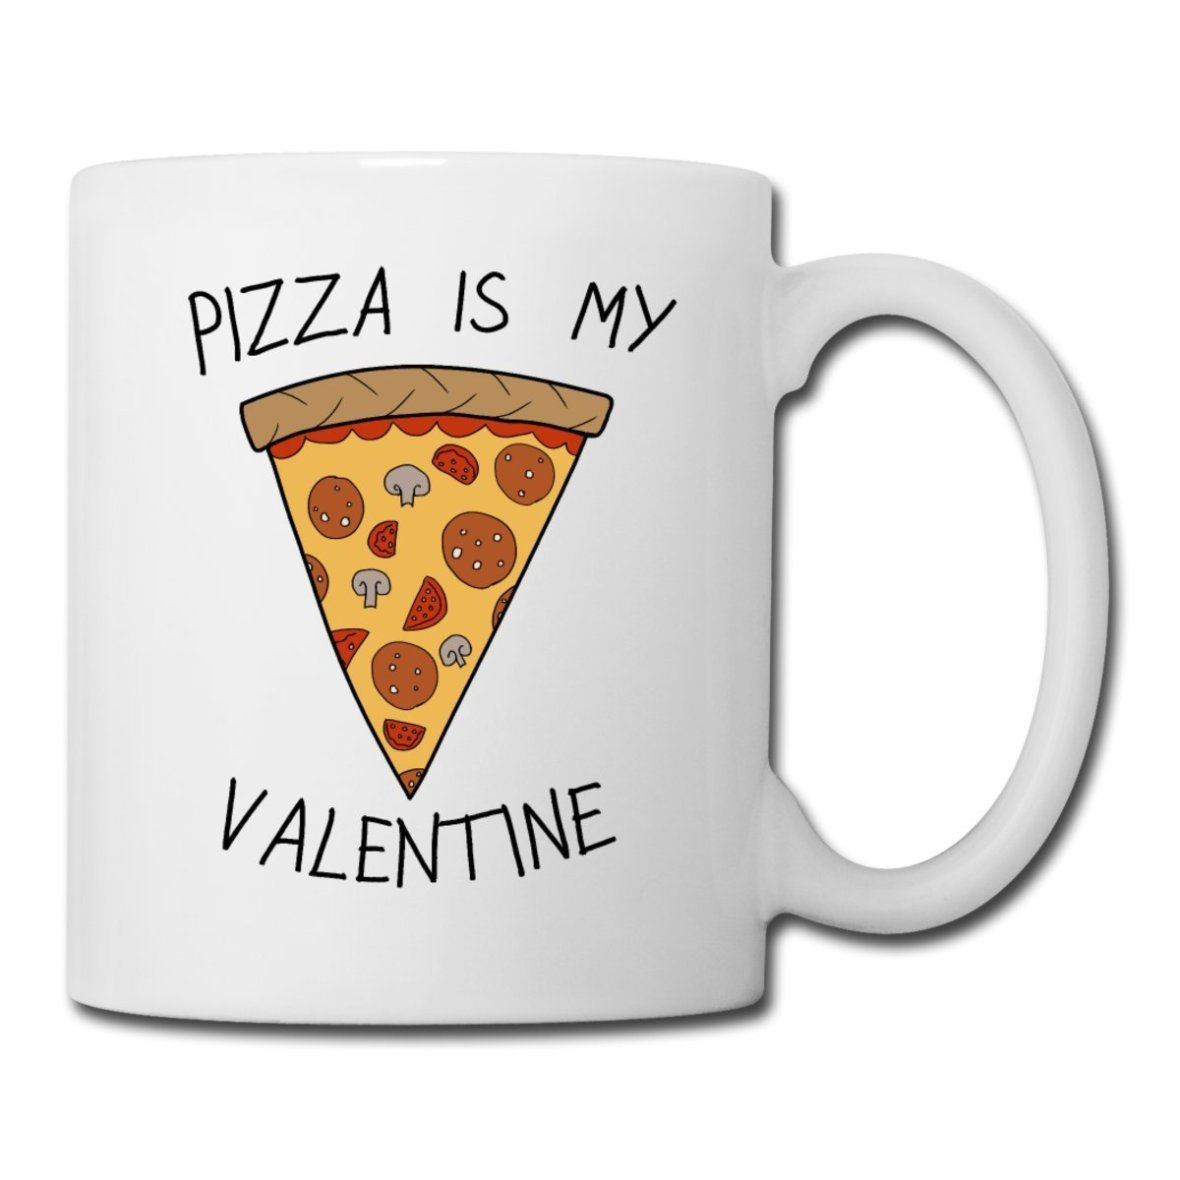 pizza is my valentine mug